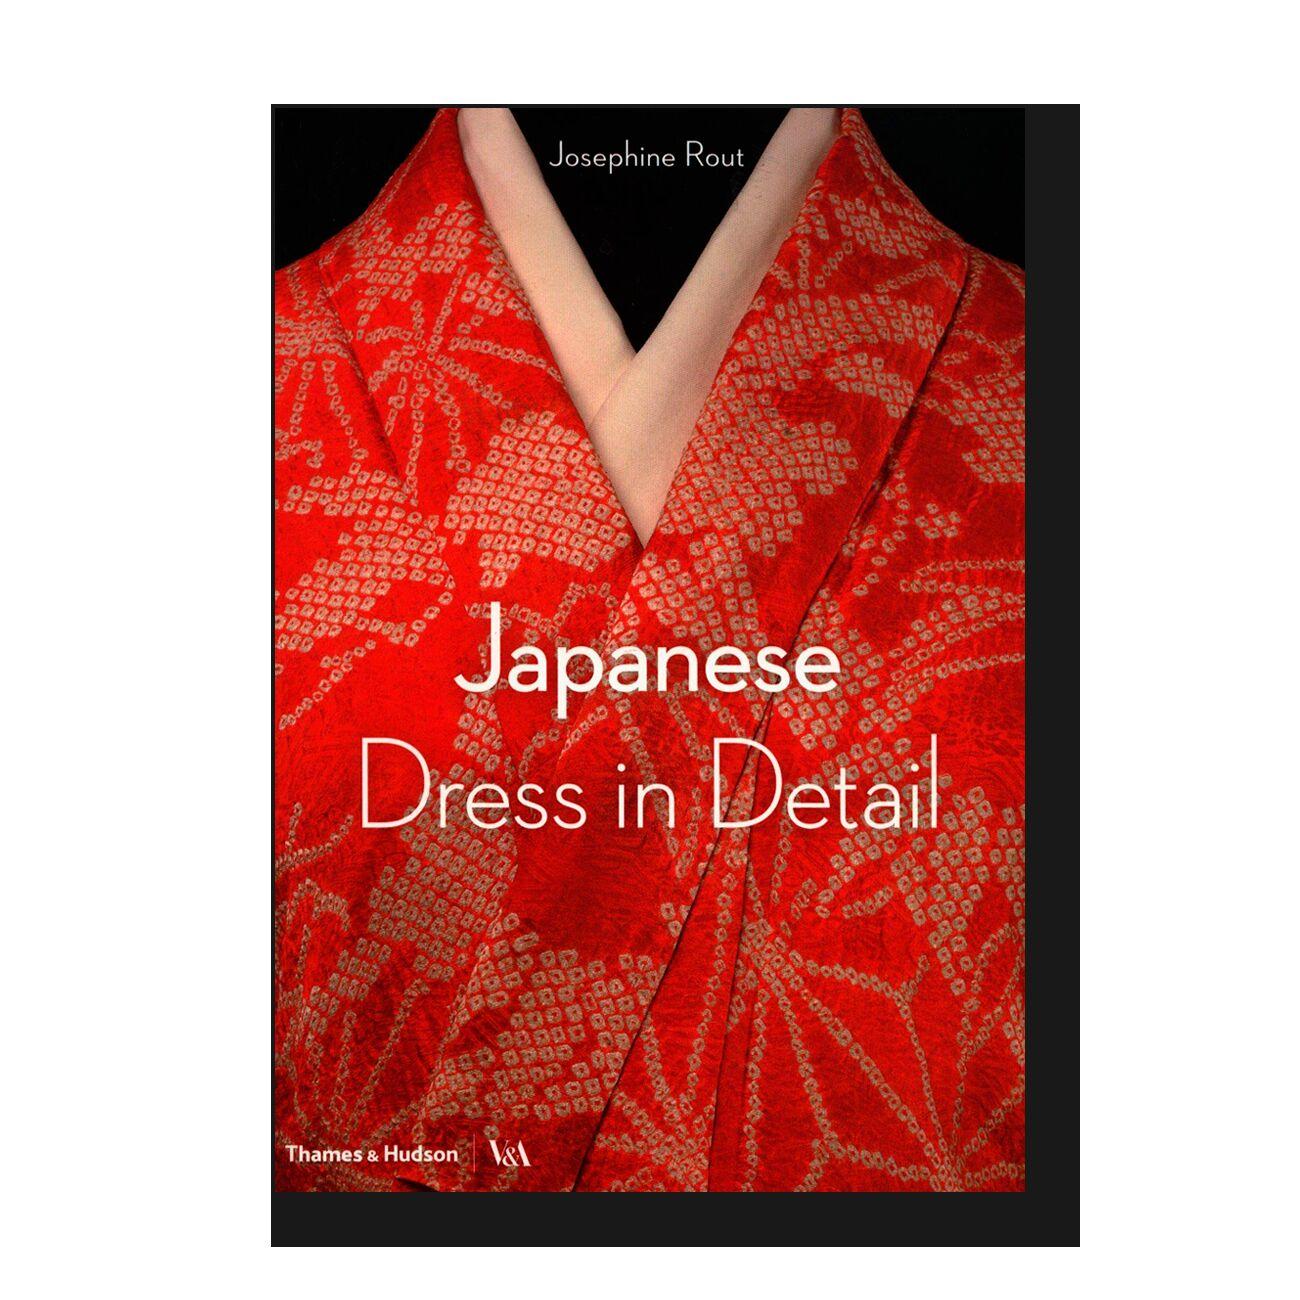 Japanese Dress in Detail